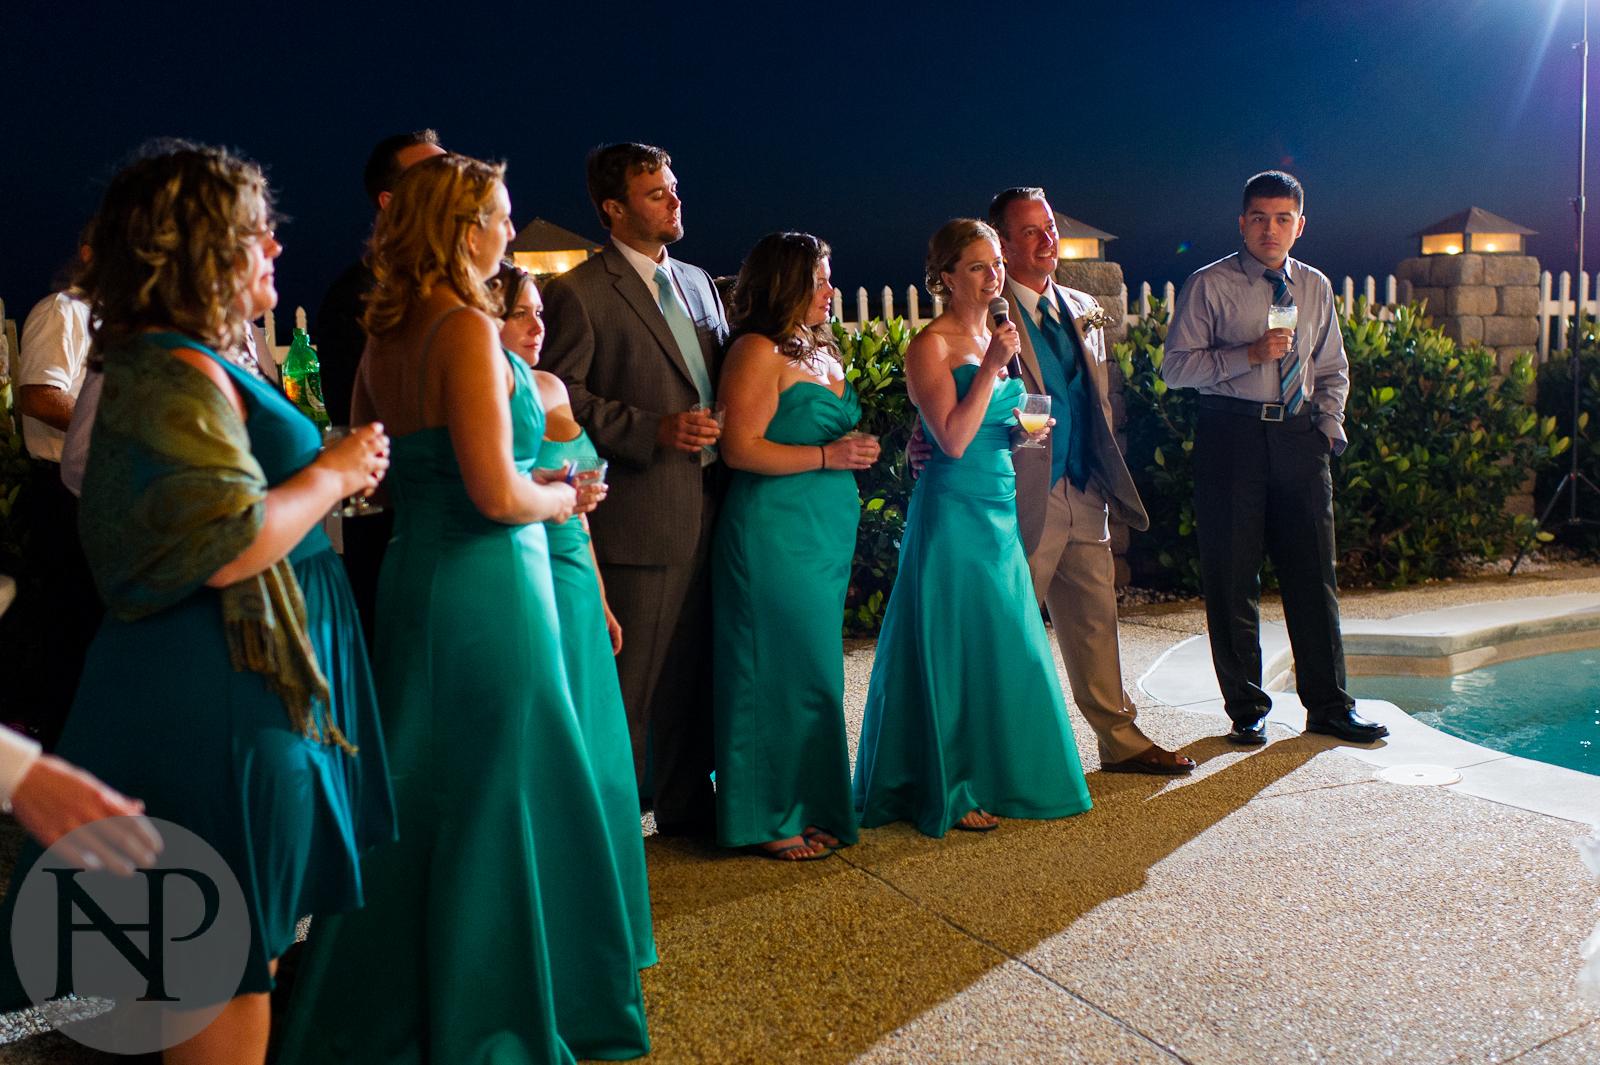 wedding photography dc photographer - district of columbia photography weddingphoto 2012_ denis kaleigh - north carolina - emerald isle - destination wedding-64.jpg